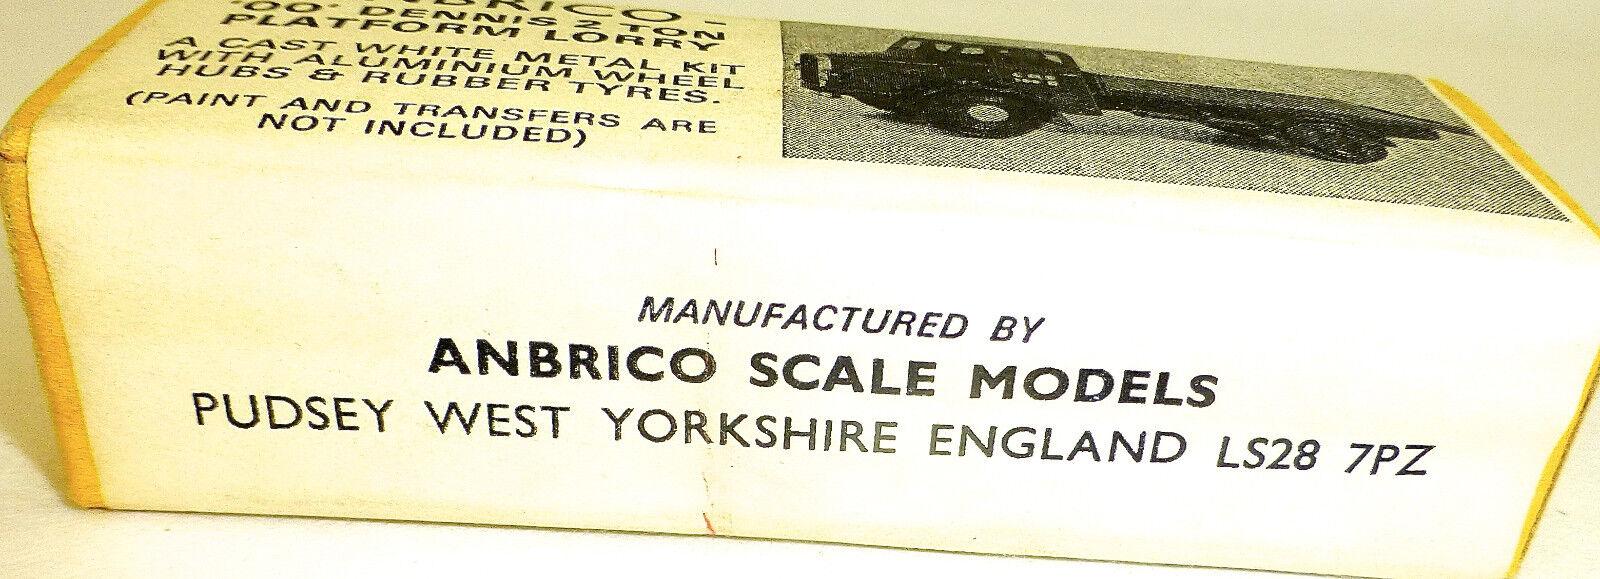 Oo Dennis 2 Tone Tone Tone Platform Lorry Metal Set Kit Anbrico Scale Models 1aa68a